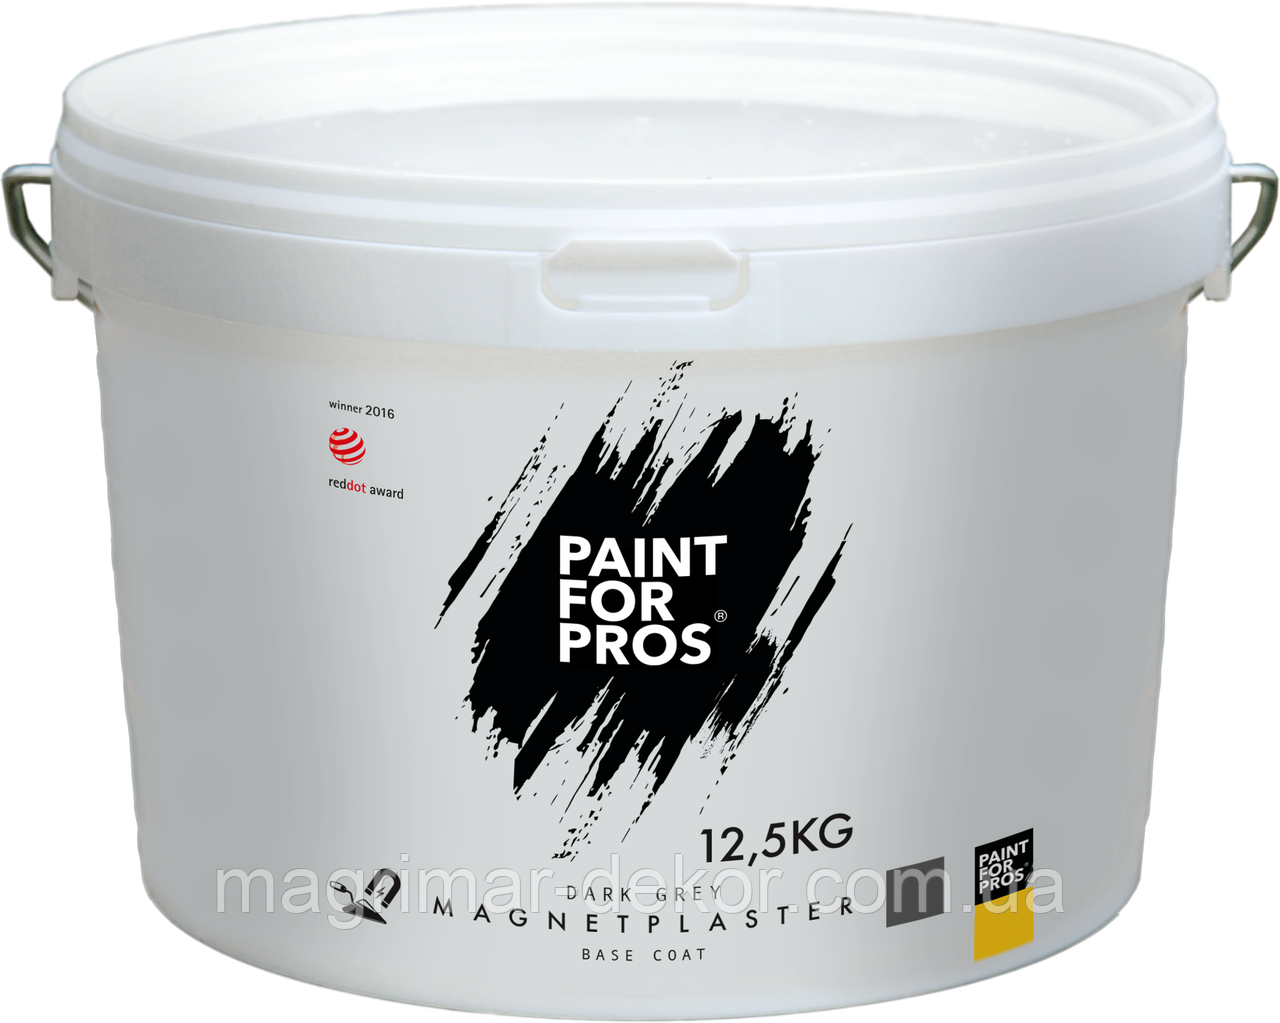 Магнитная штукатурка PaintforPro's Magnet Plaster 12,5 кг